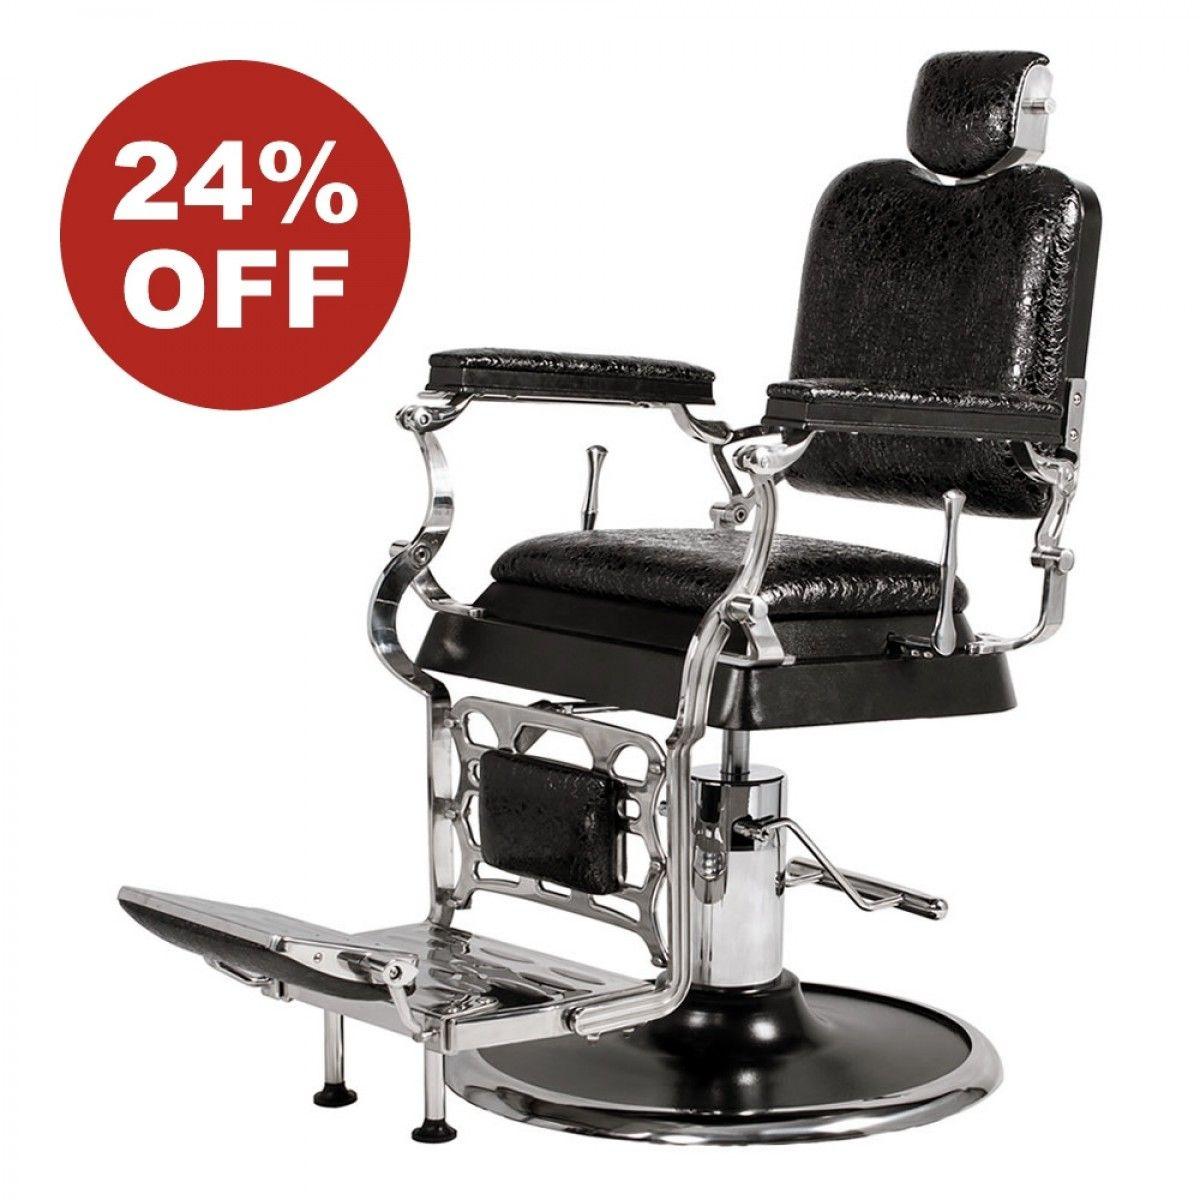 heavy duty shop chair with wheels